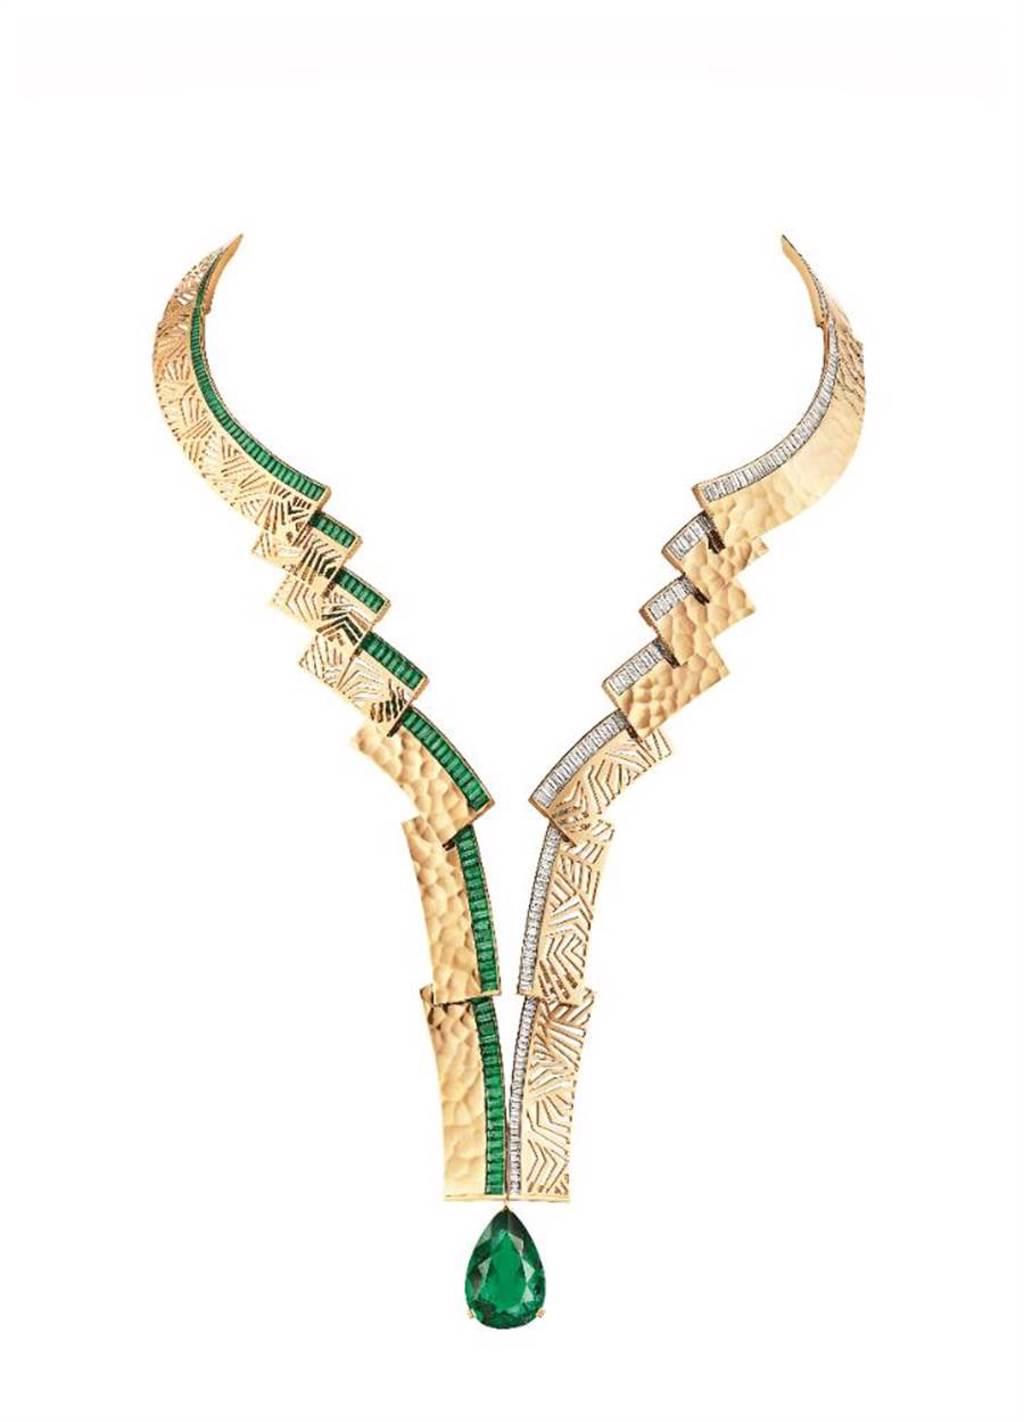 CHAUMET黃金打造的Skyline項鍊,祖母綠與鑽石以不對稱的方式彼此對比呼應,約8000萬元。(CHAUMET提供)